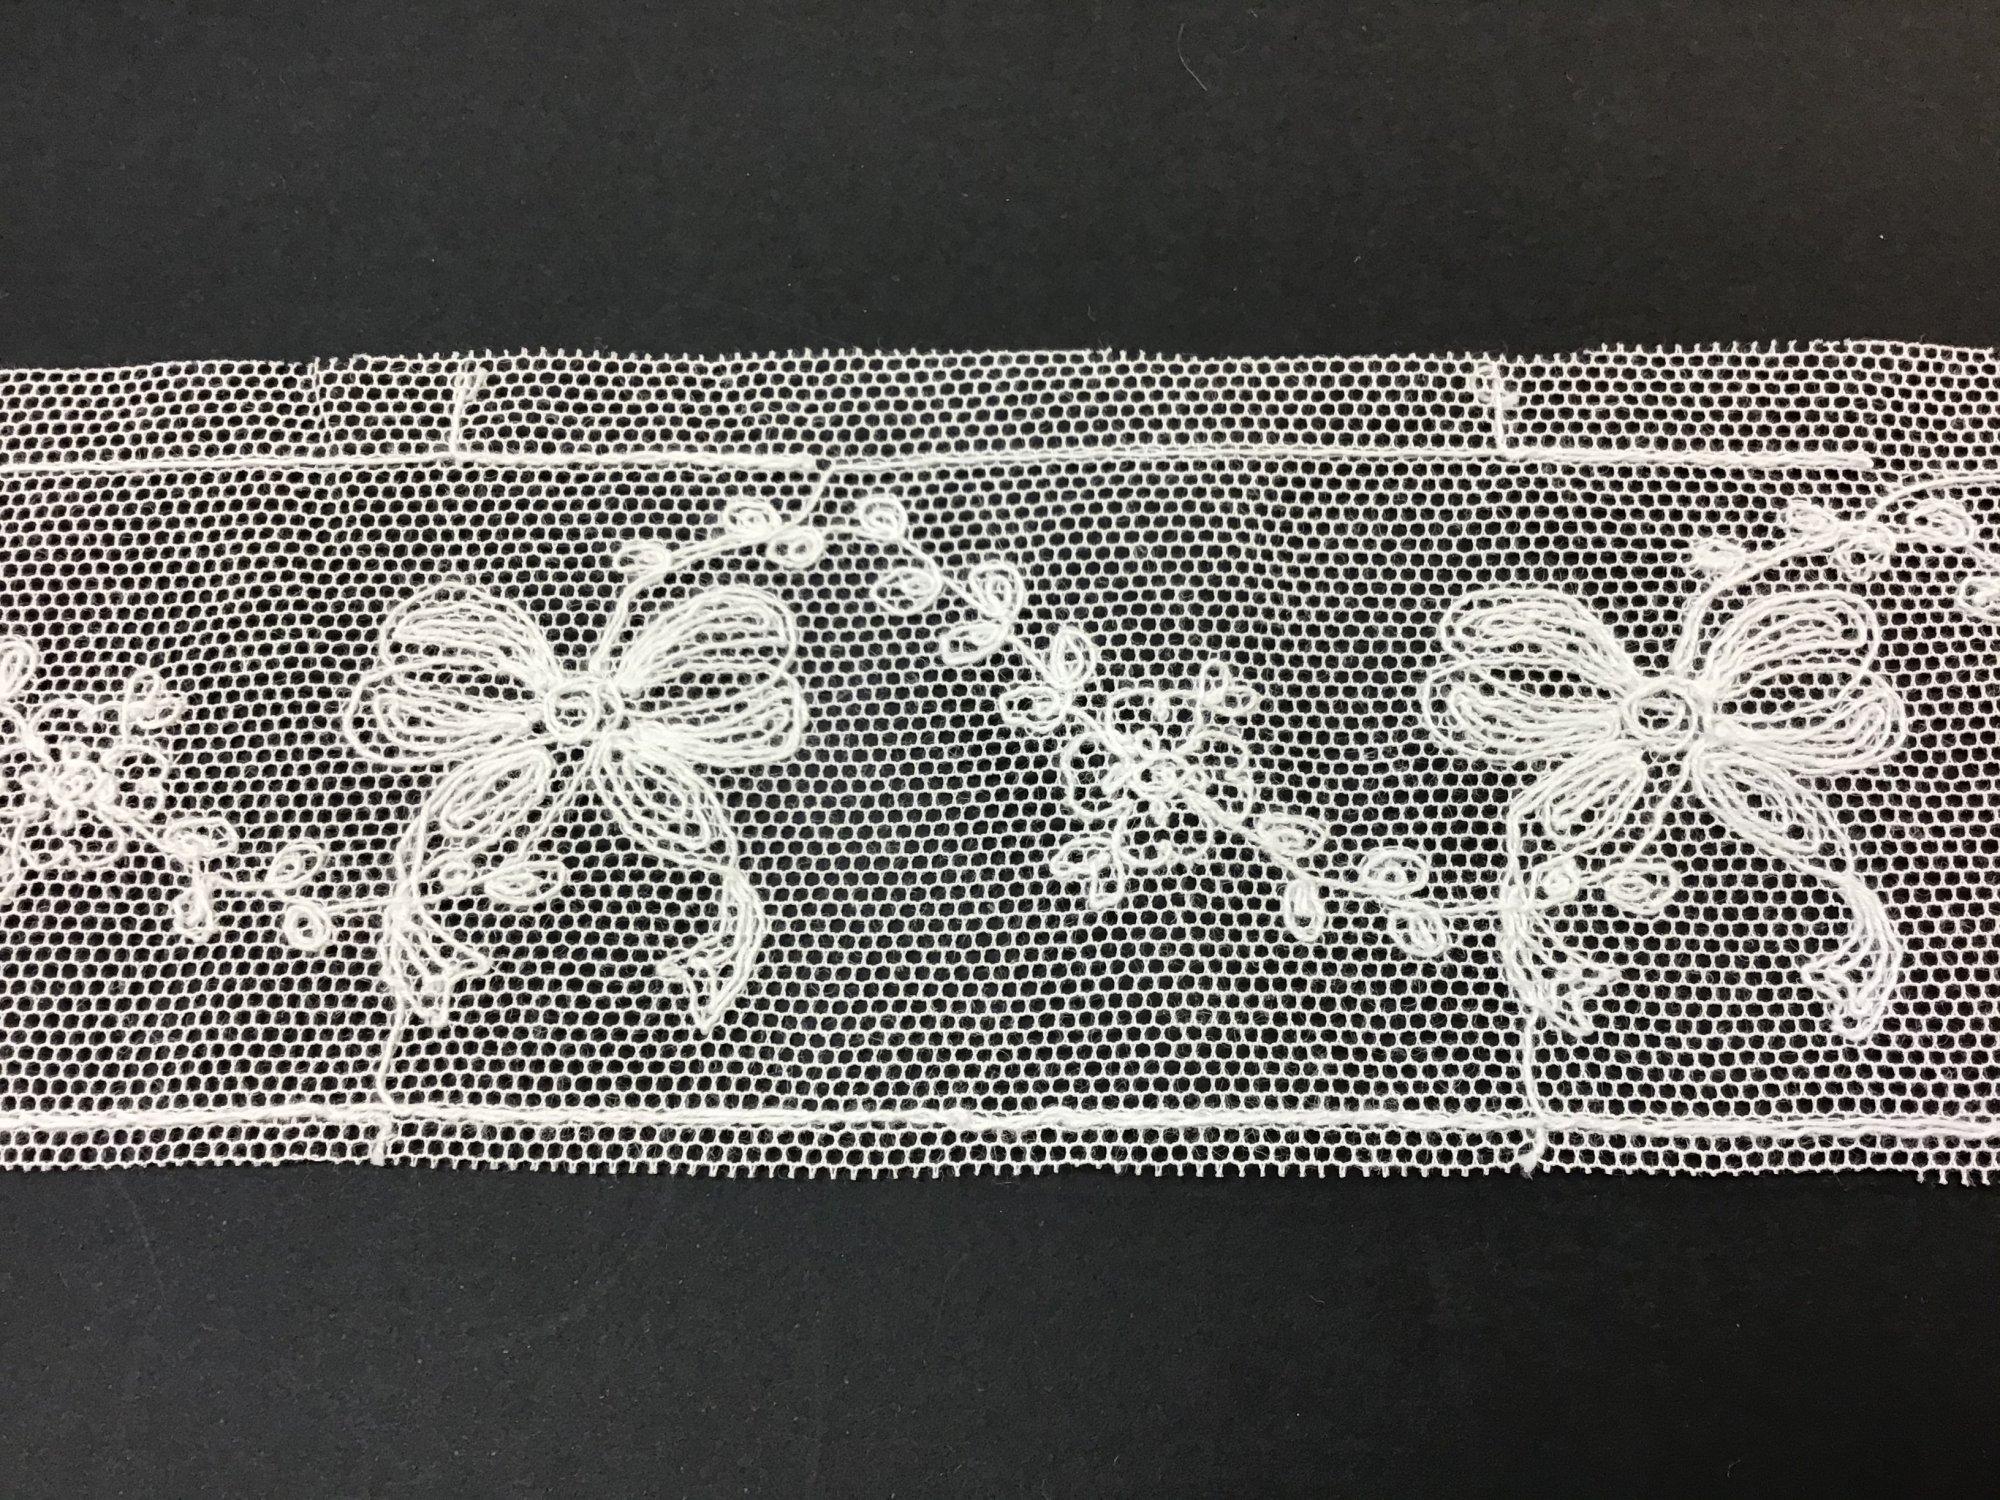 English Netting Lace Insertion 2 inch Soft White NM41-B